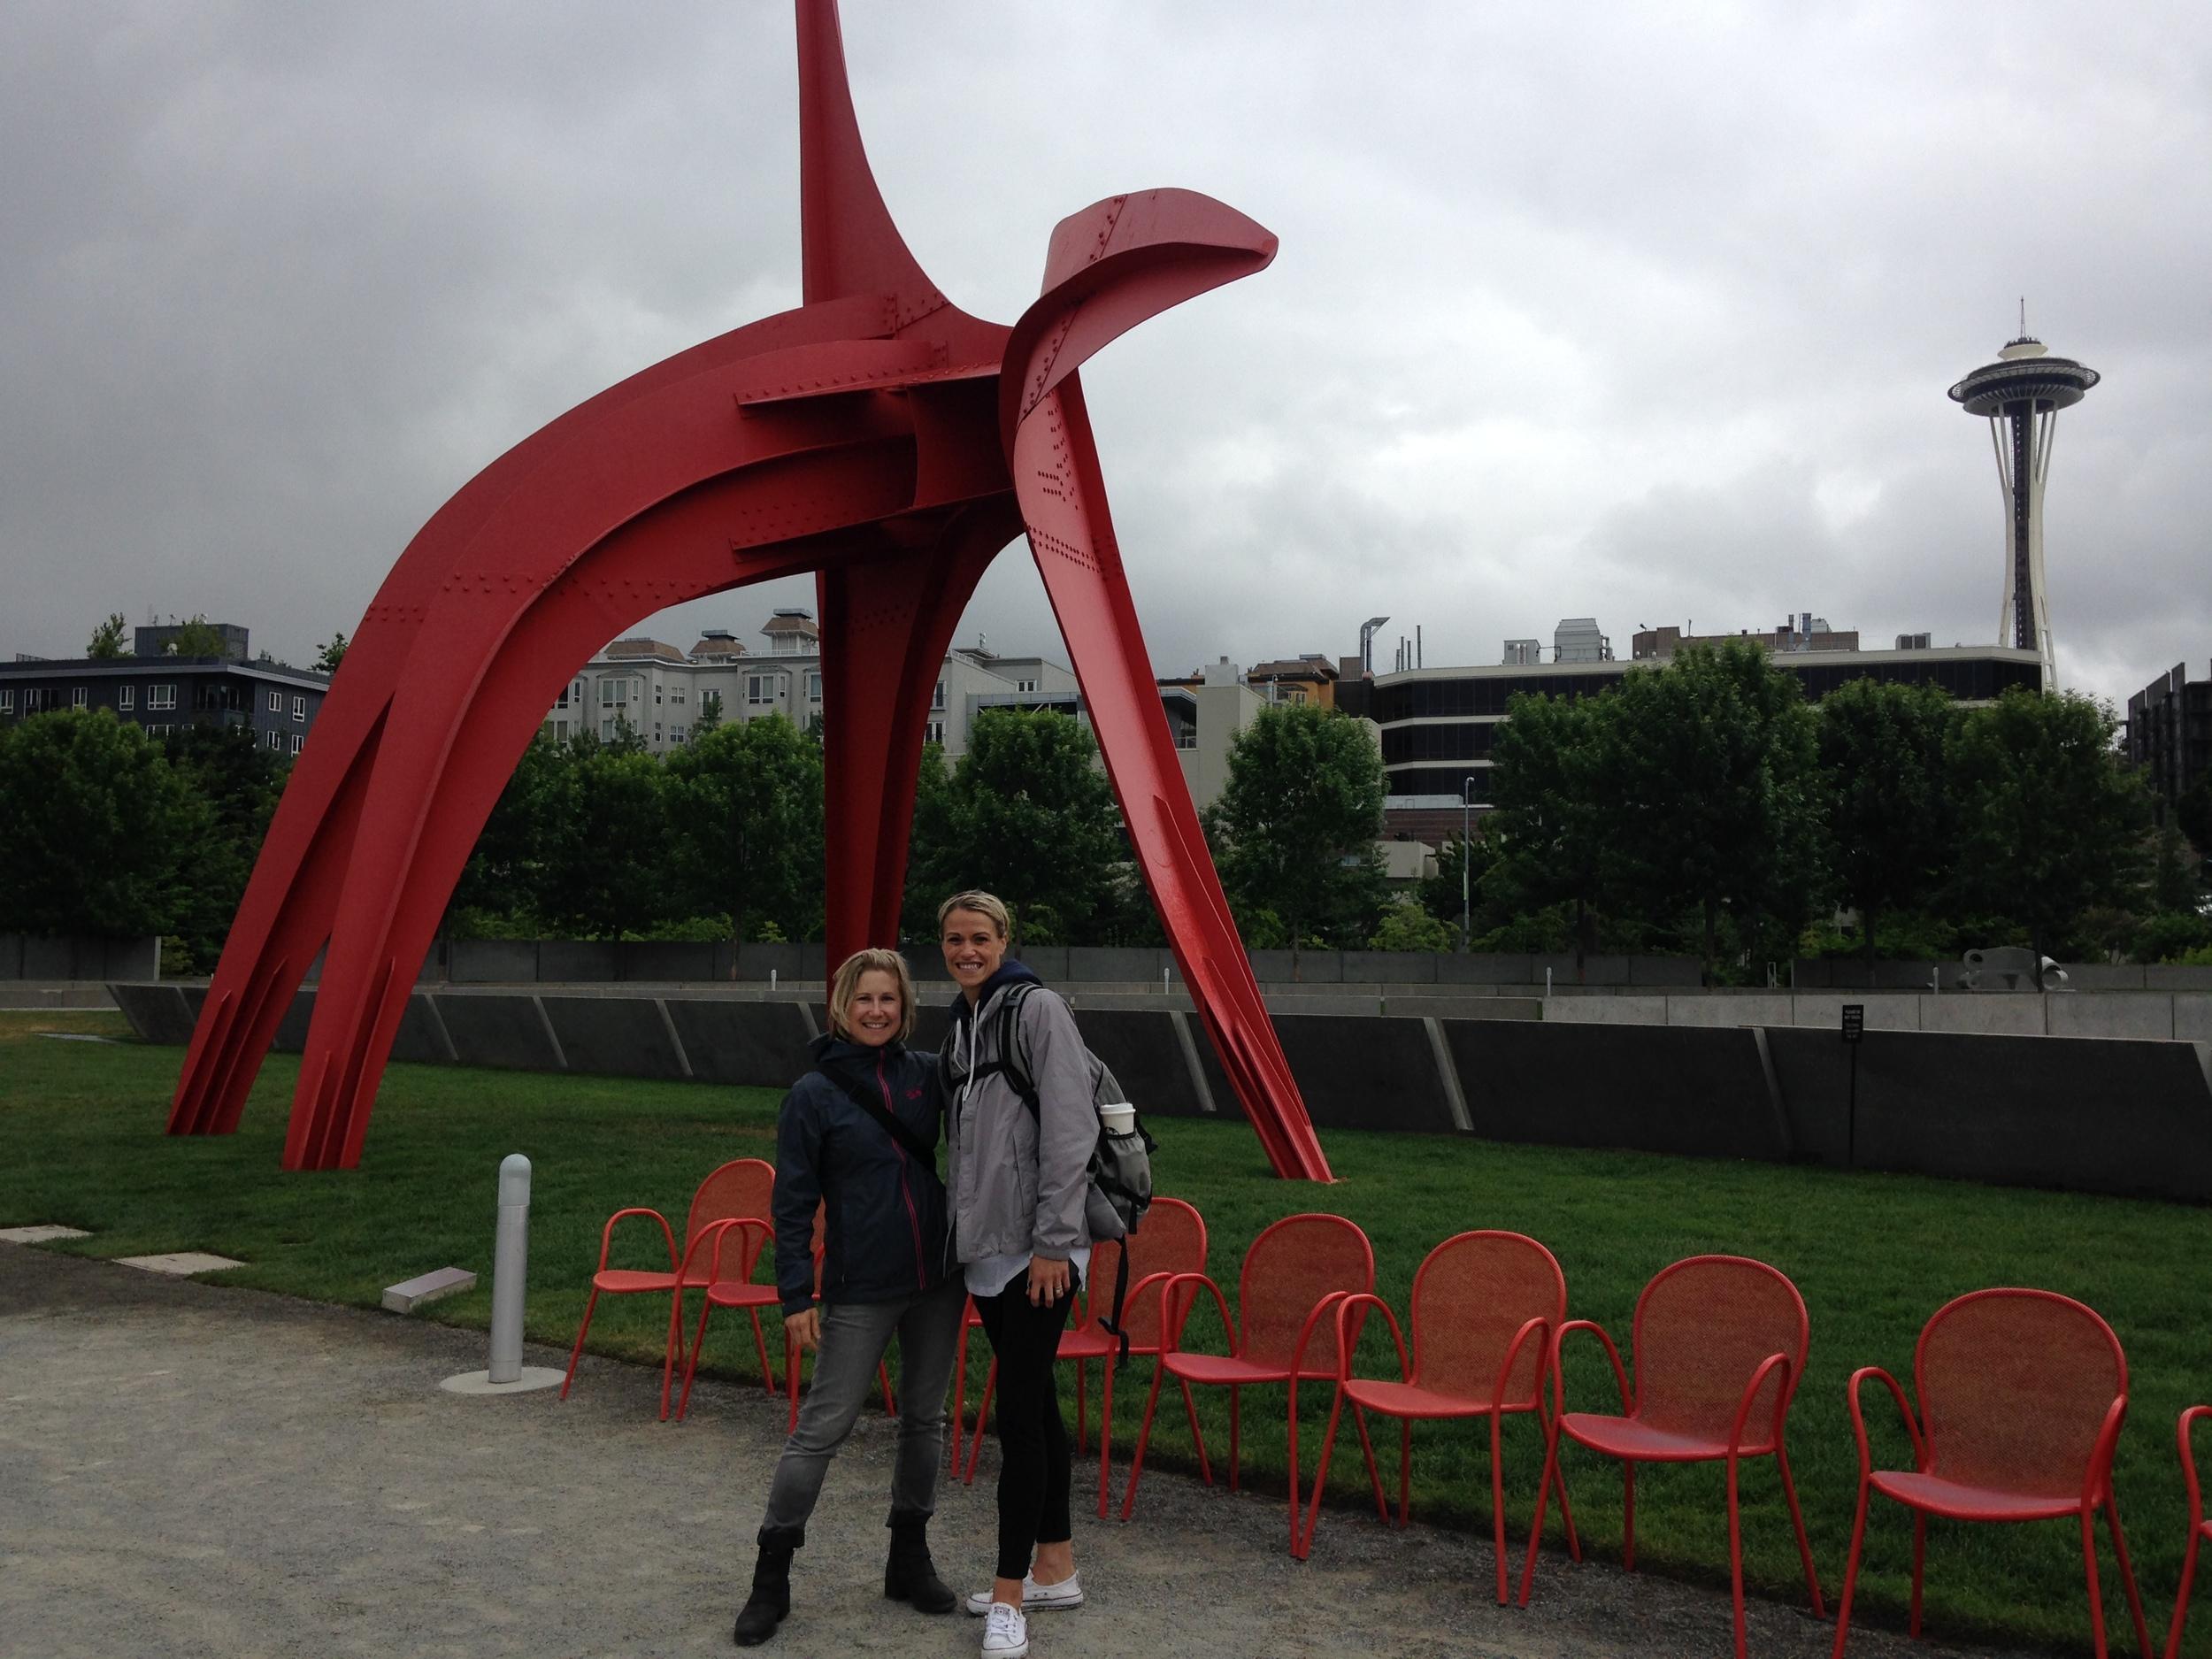 Mrs. Descheemaeker and Mrs. Hammerquist enjoy their day in the city taking in the art.